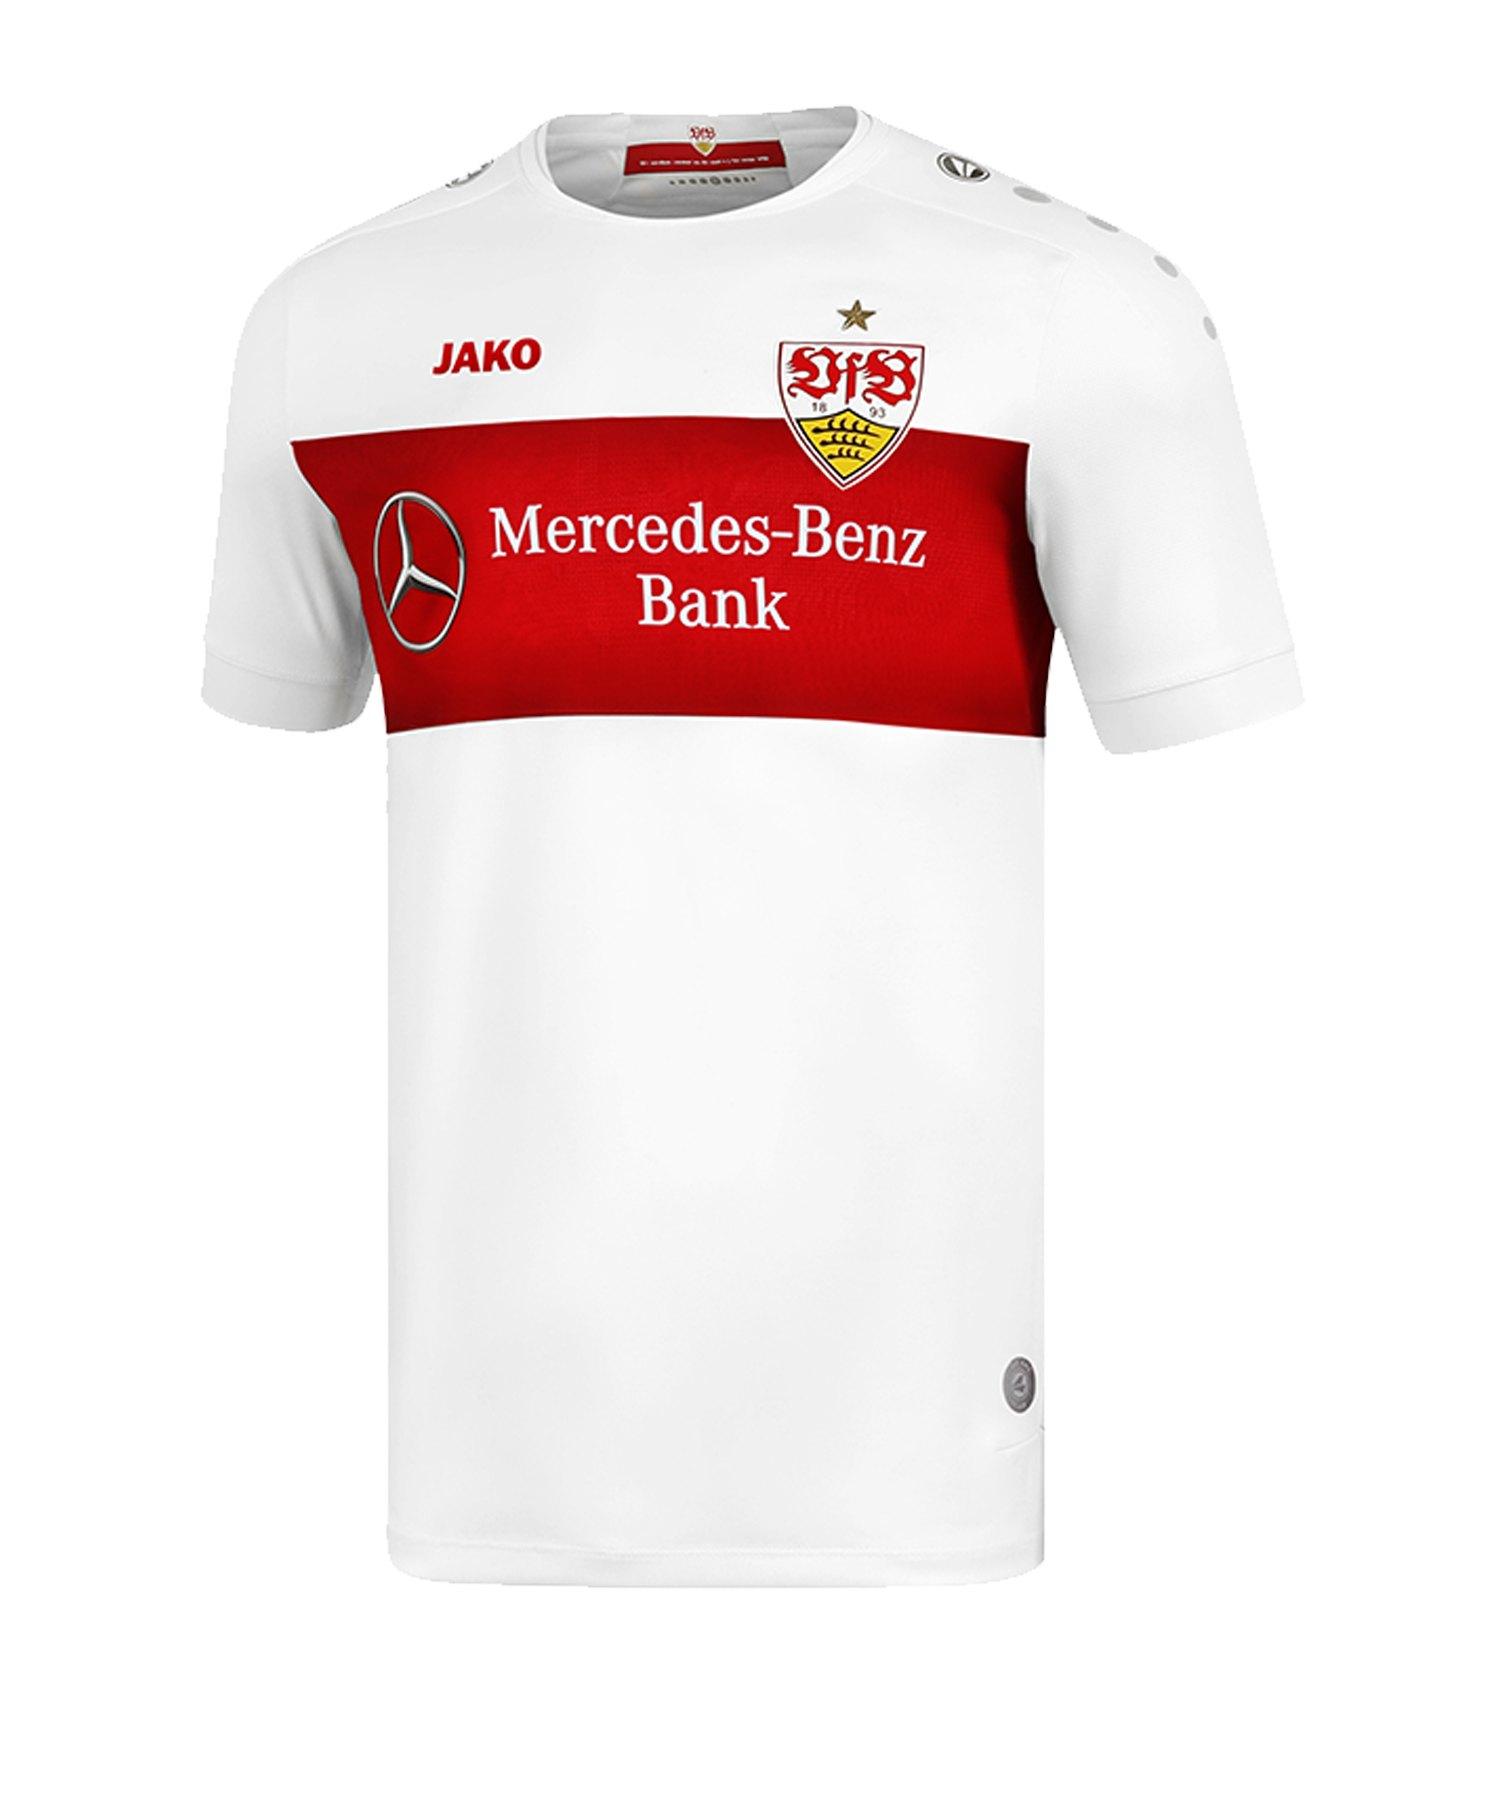 JAKO VfB Stuttgart Trikot 3rd 2019/2020 Schwarz F08 - schwarz